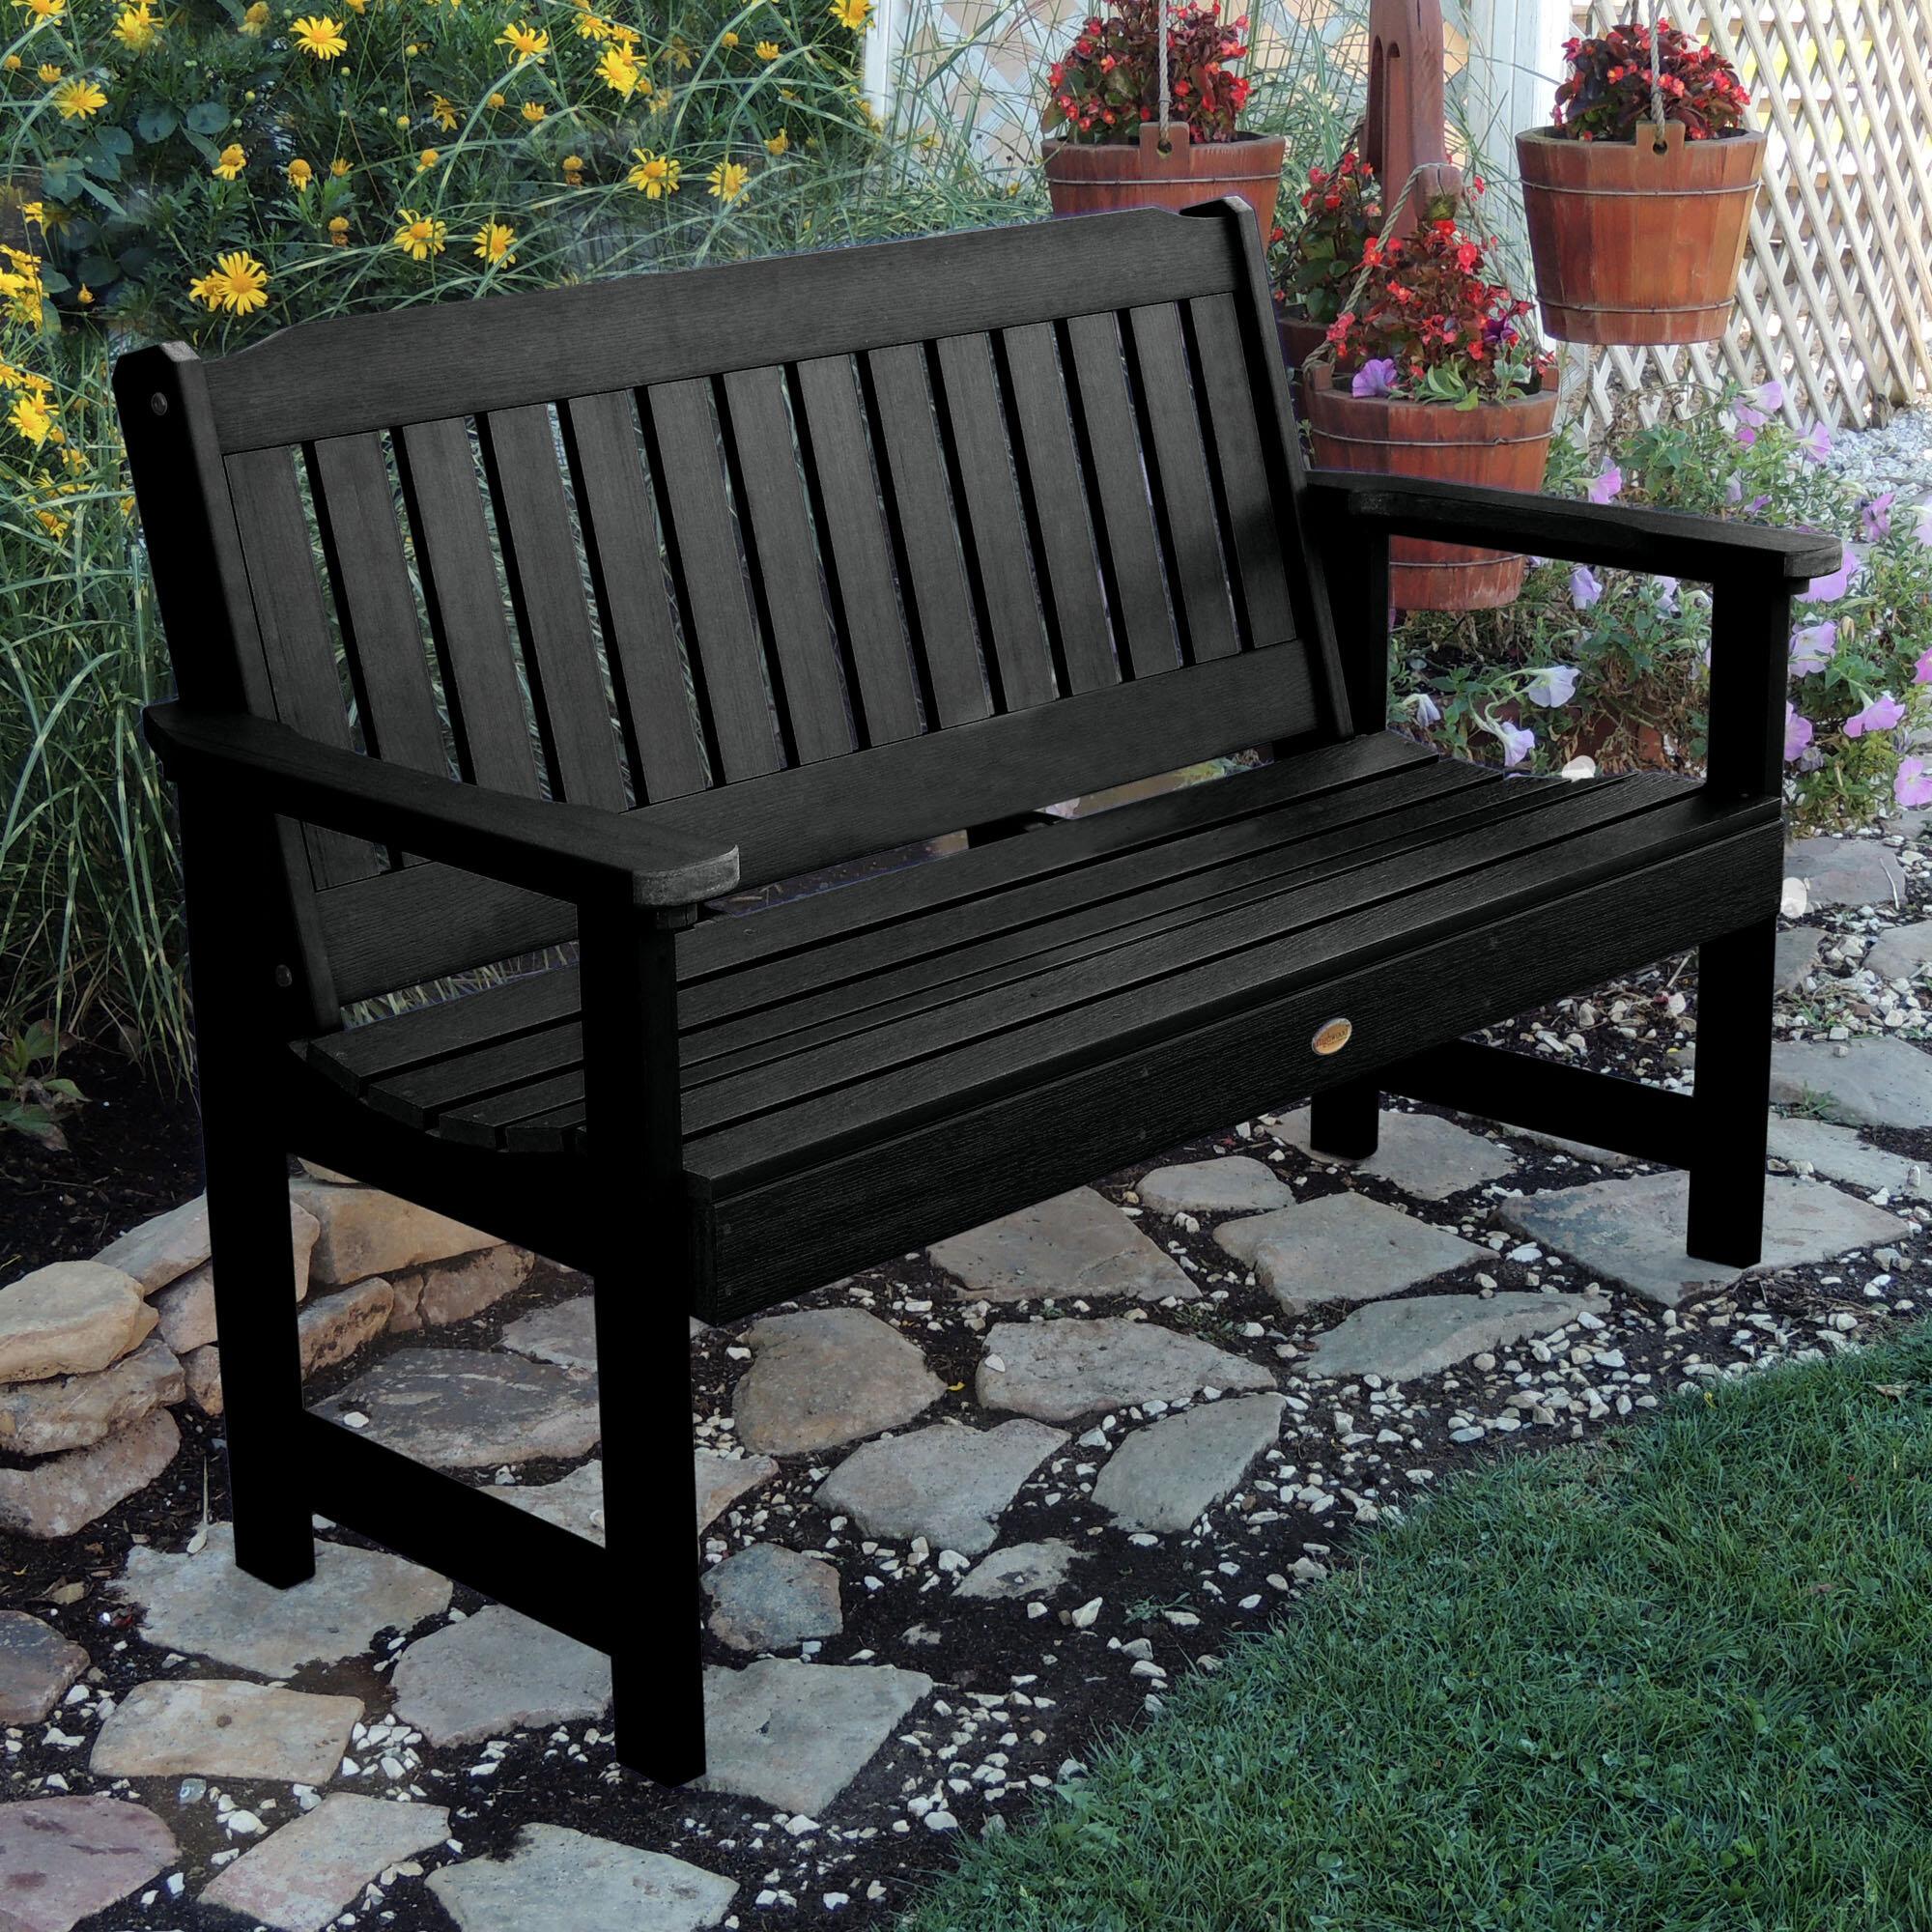 Amelia Plastic Garden Bench With Regard To Alfon Wood Garden Benches (View 23 of 25)